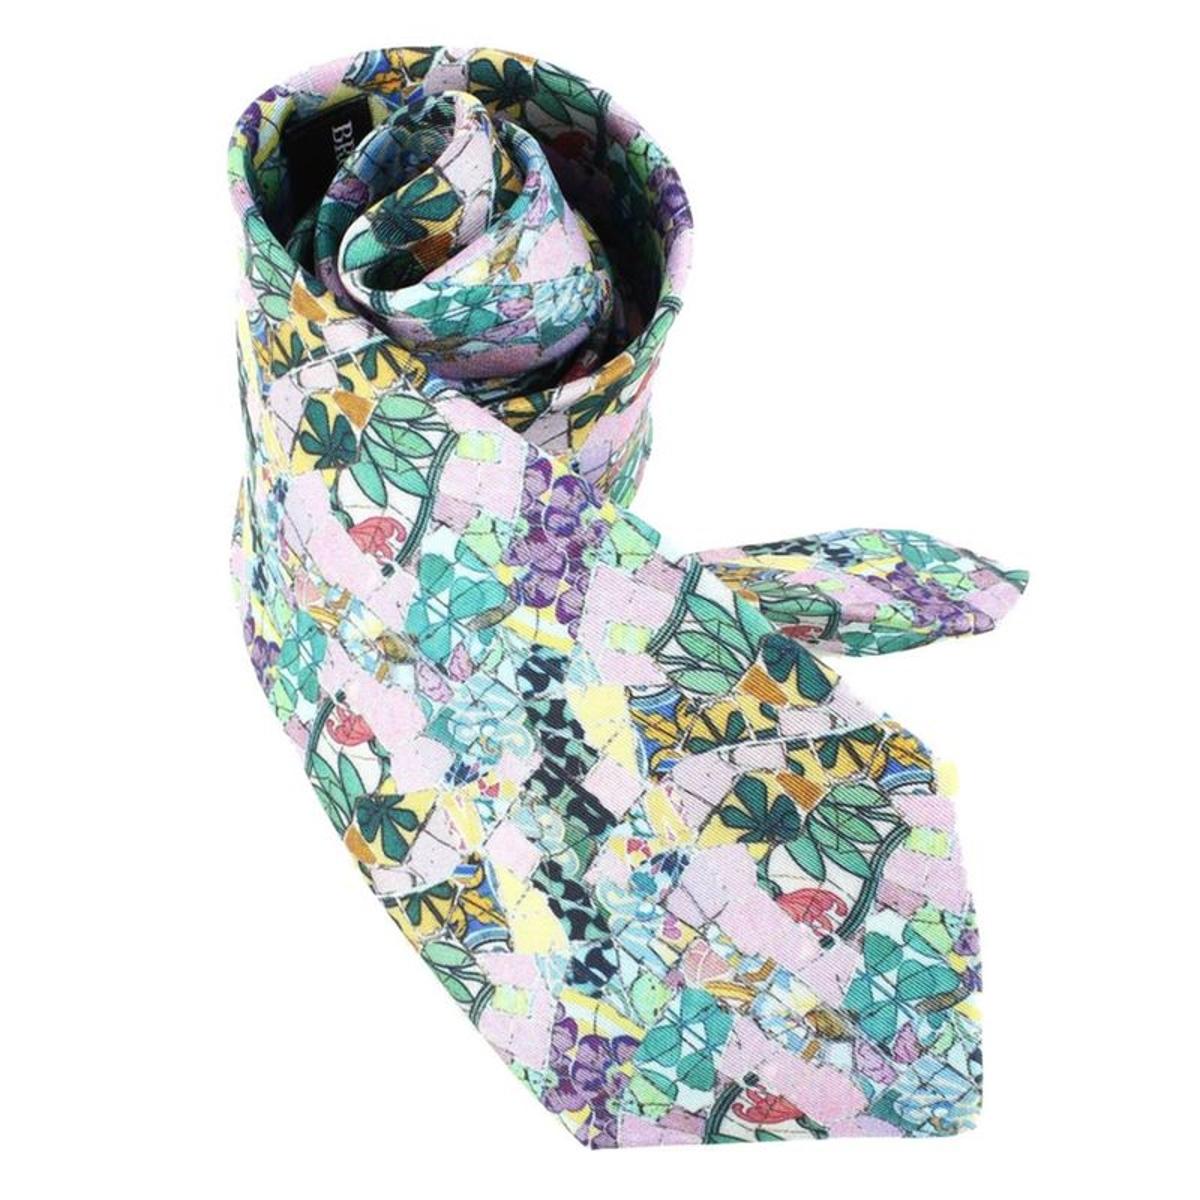 Cravate Lyonnaise  en soie  GAUDI FLEURS MAURESQUES, Made in France